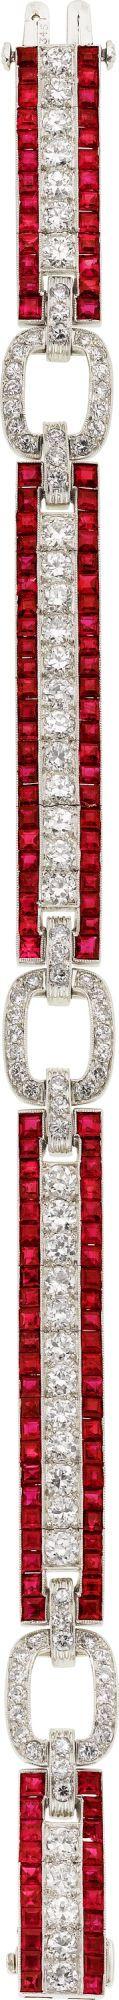 Art Deco Ruby, Diamond, Platinum Bracelet, Oscar Heyman Bros.